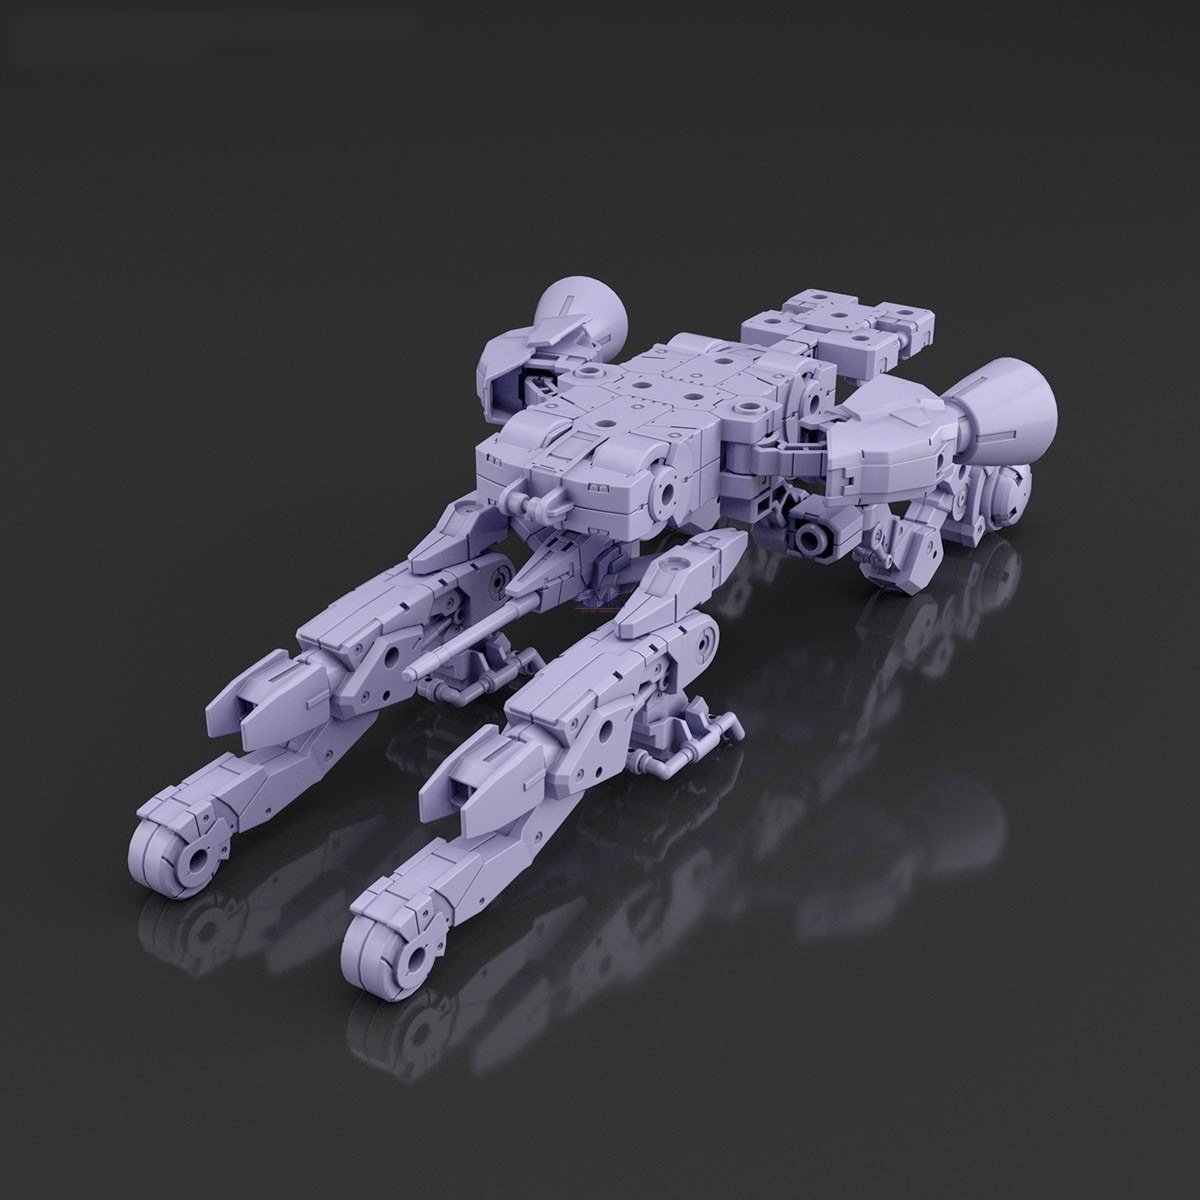 Bandai 30MM Extended Armament Vehicle (Space Craft Ver.) [Purple] 1.0.jpg